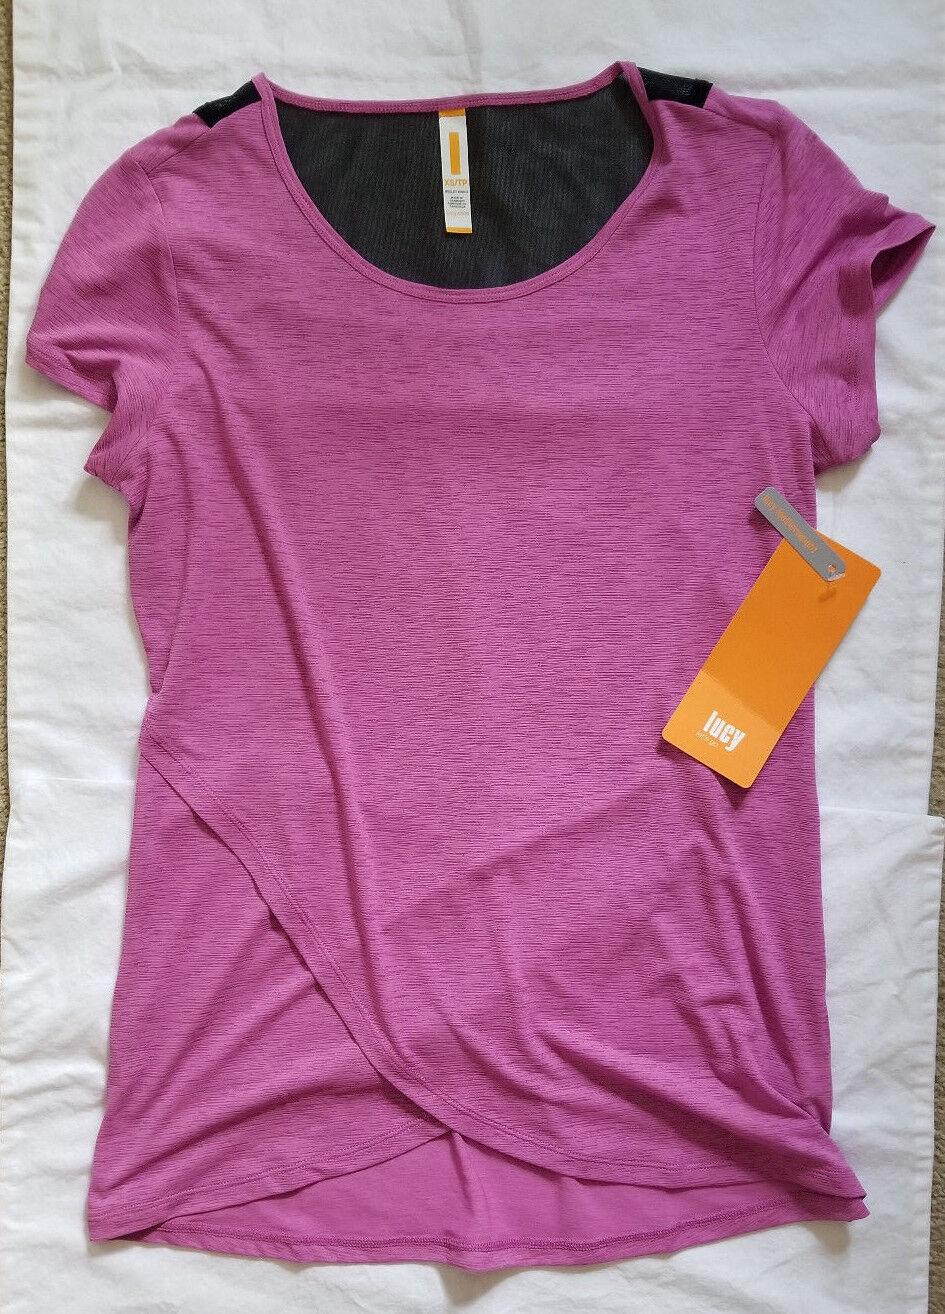 Lucy Activewear Sun Salutation Short Sleeve Top XS NEW